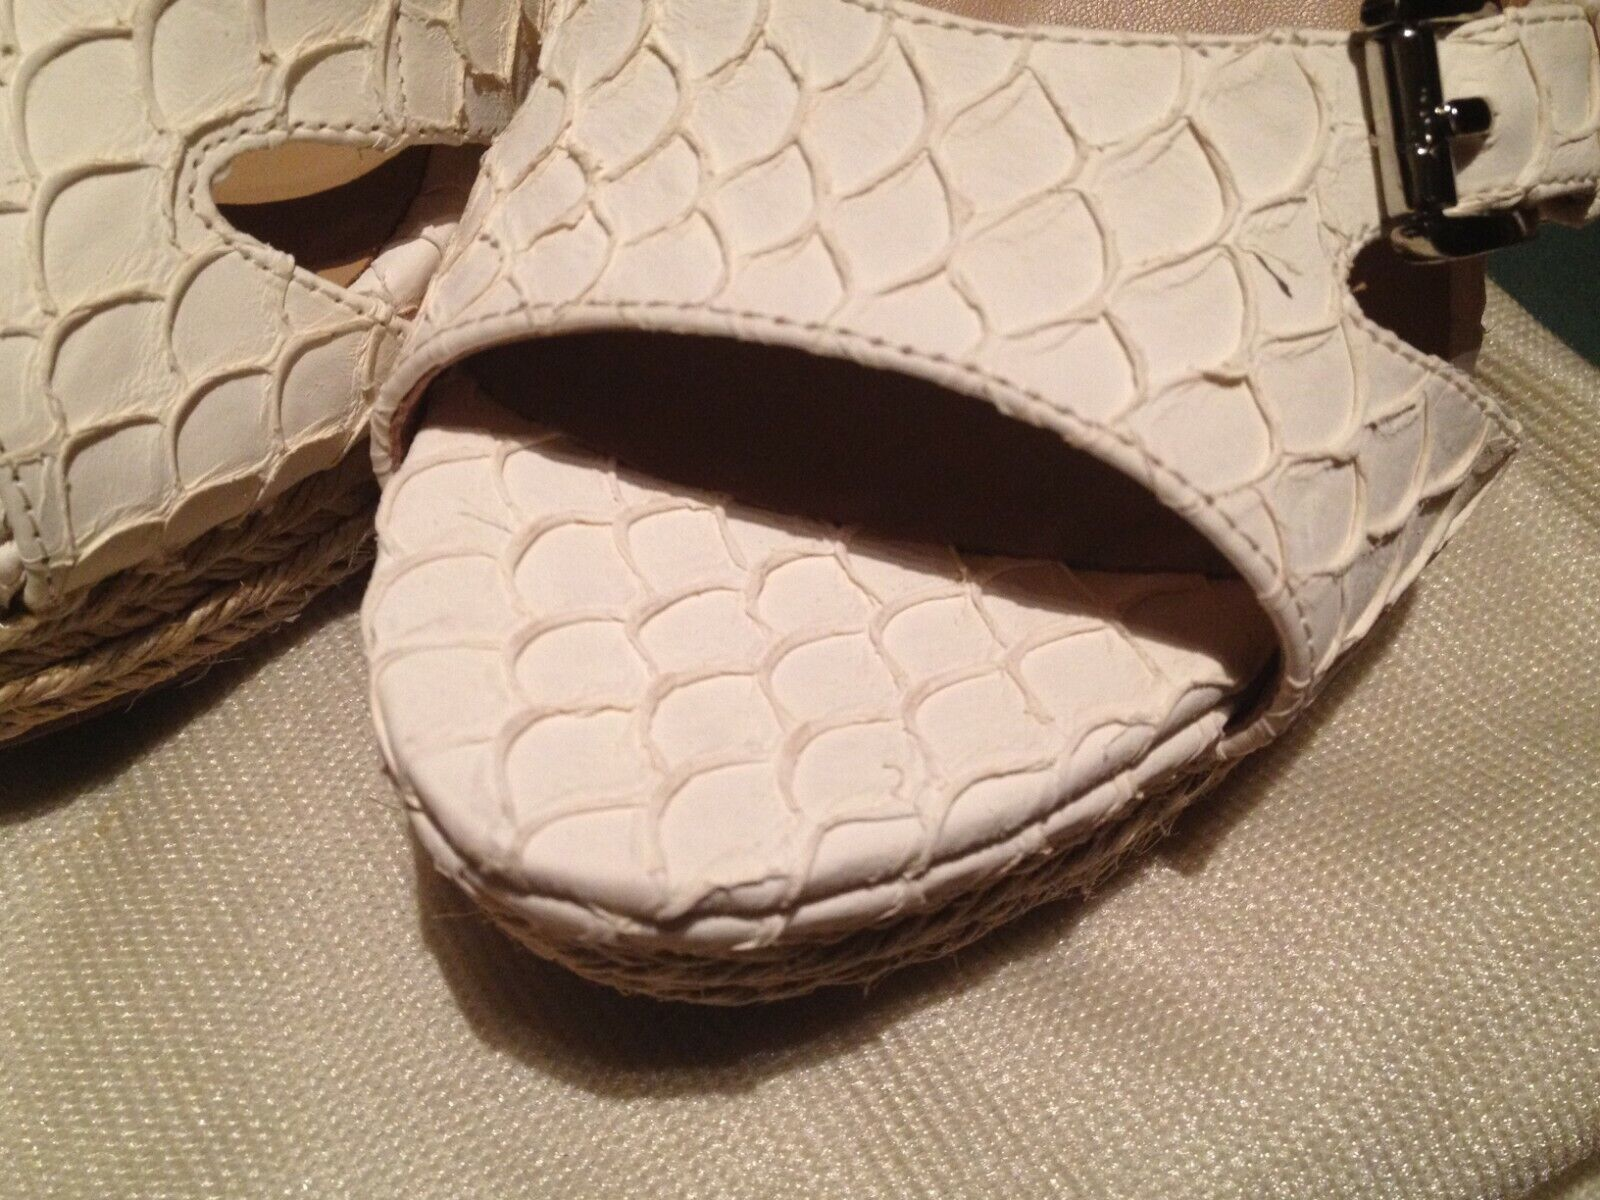 NIB NIB NIB Lisa Donald Pliner 'White Rock' Leather Cork Wedge Sandals Size 9.5M 032433